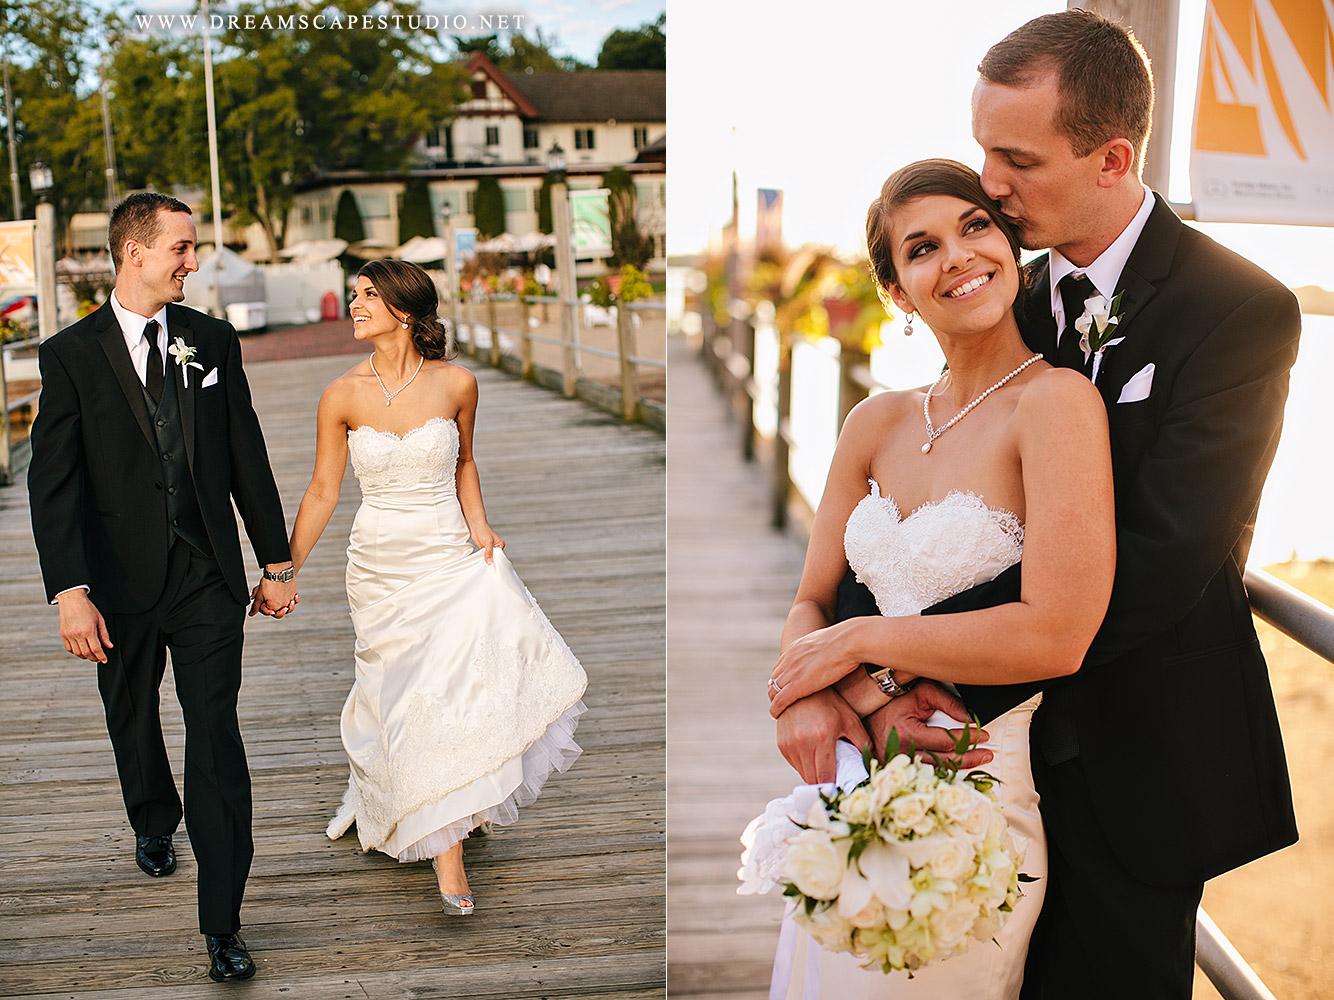 CT_Wedding_Photography_Liz_Justin_35LiJu.jpg